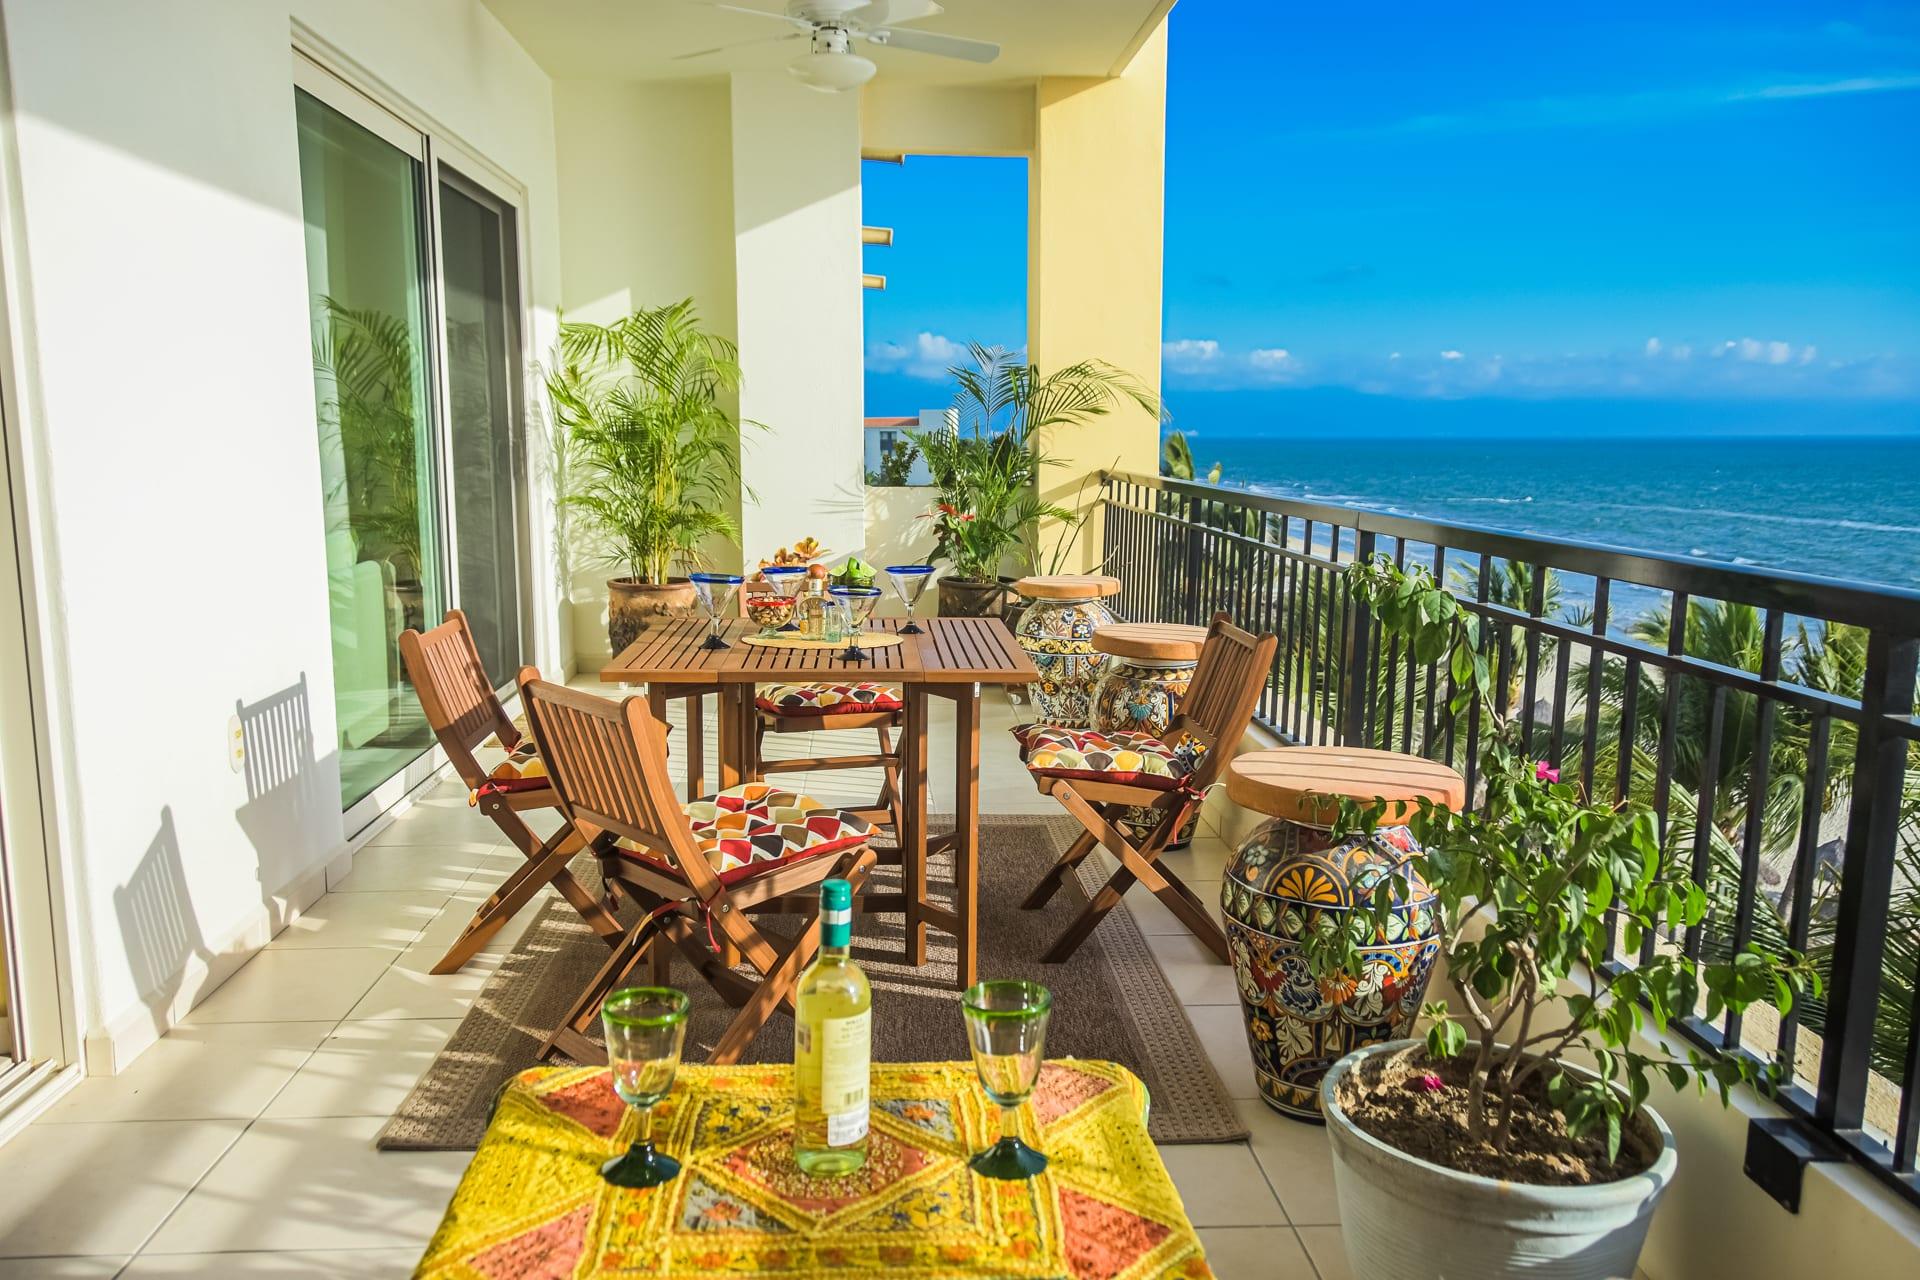 Ocean Front 2BR Condo! Breathtaking Views! Pool!! Beach Palapa seating!